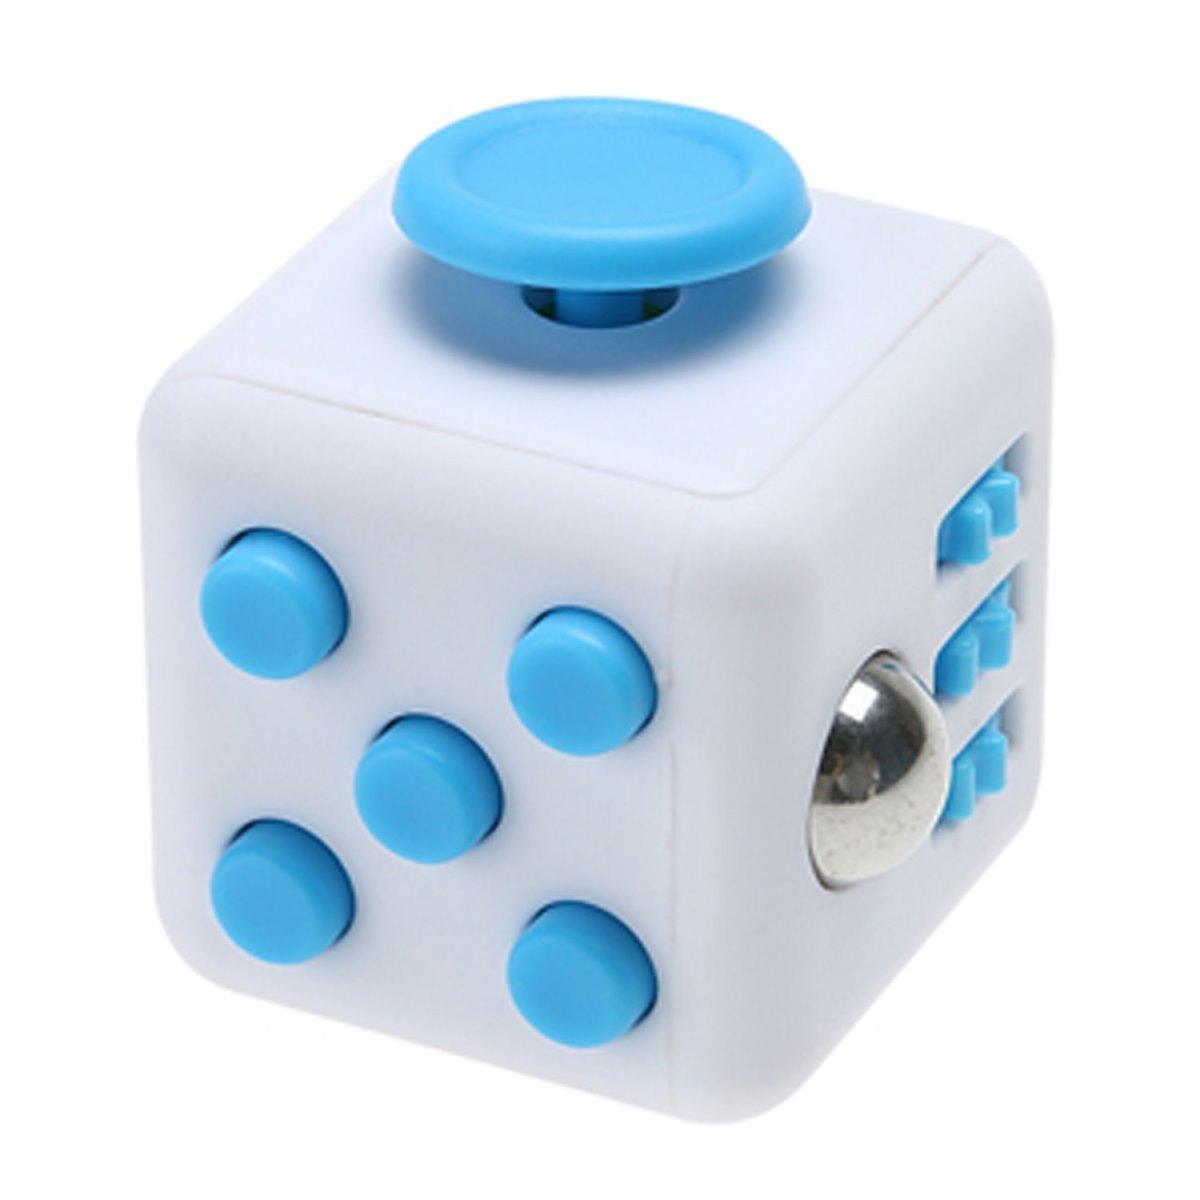 Игрушка-антистресс - FidgetCube Light, бело-синийАнтистресс кубики Fidget Cube<br>Игрушка-антистресс - FidgetCube Light, бело-синий<br>